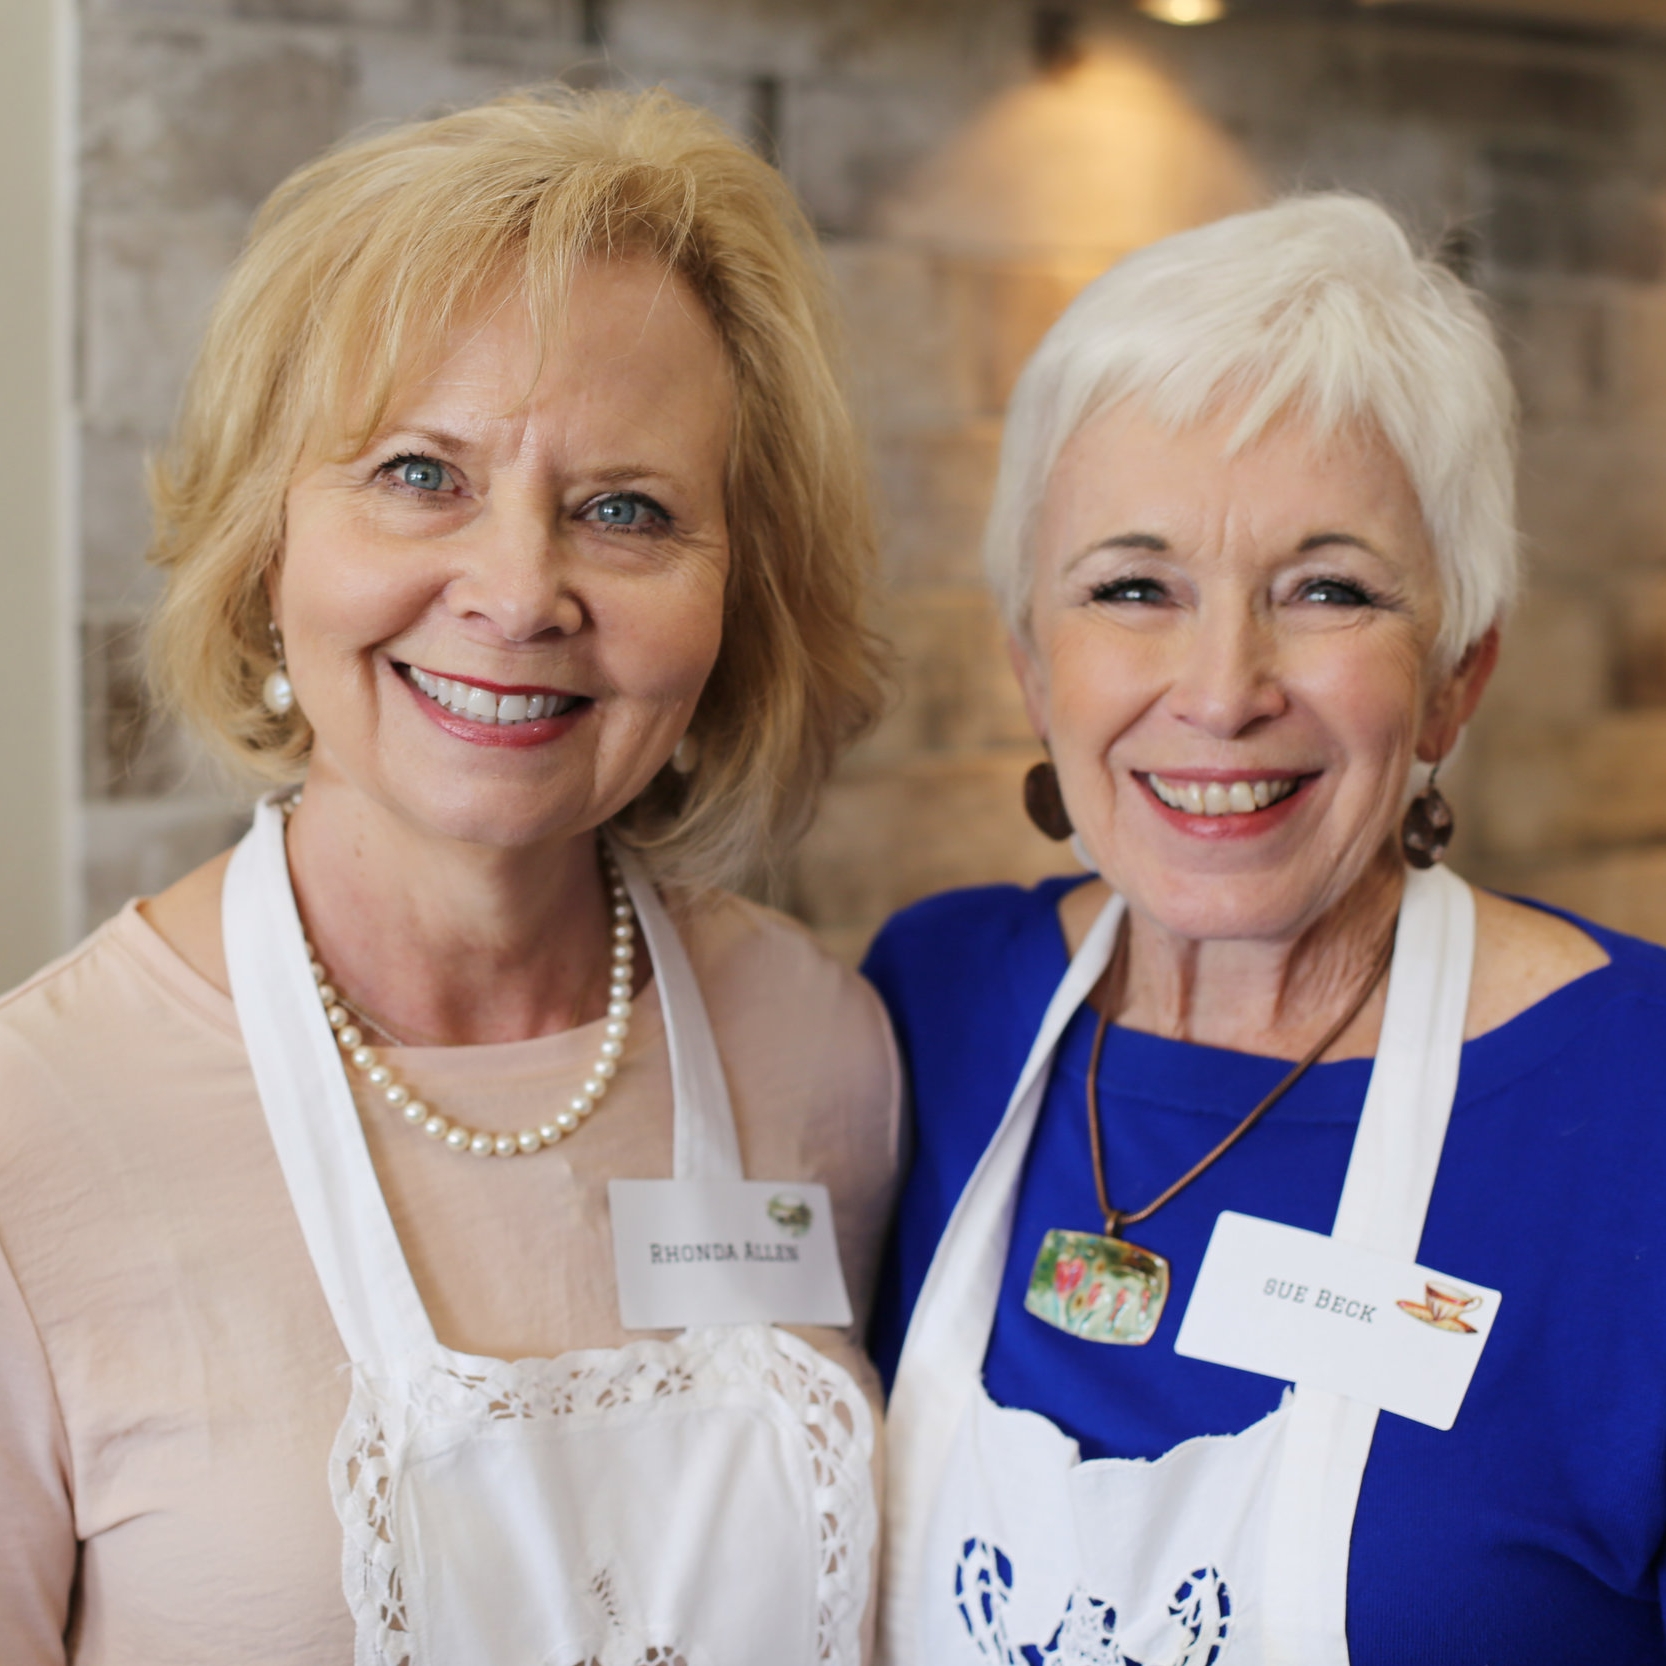 Rhonda Allen and Sue Beck